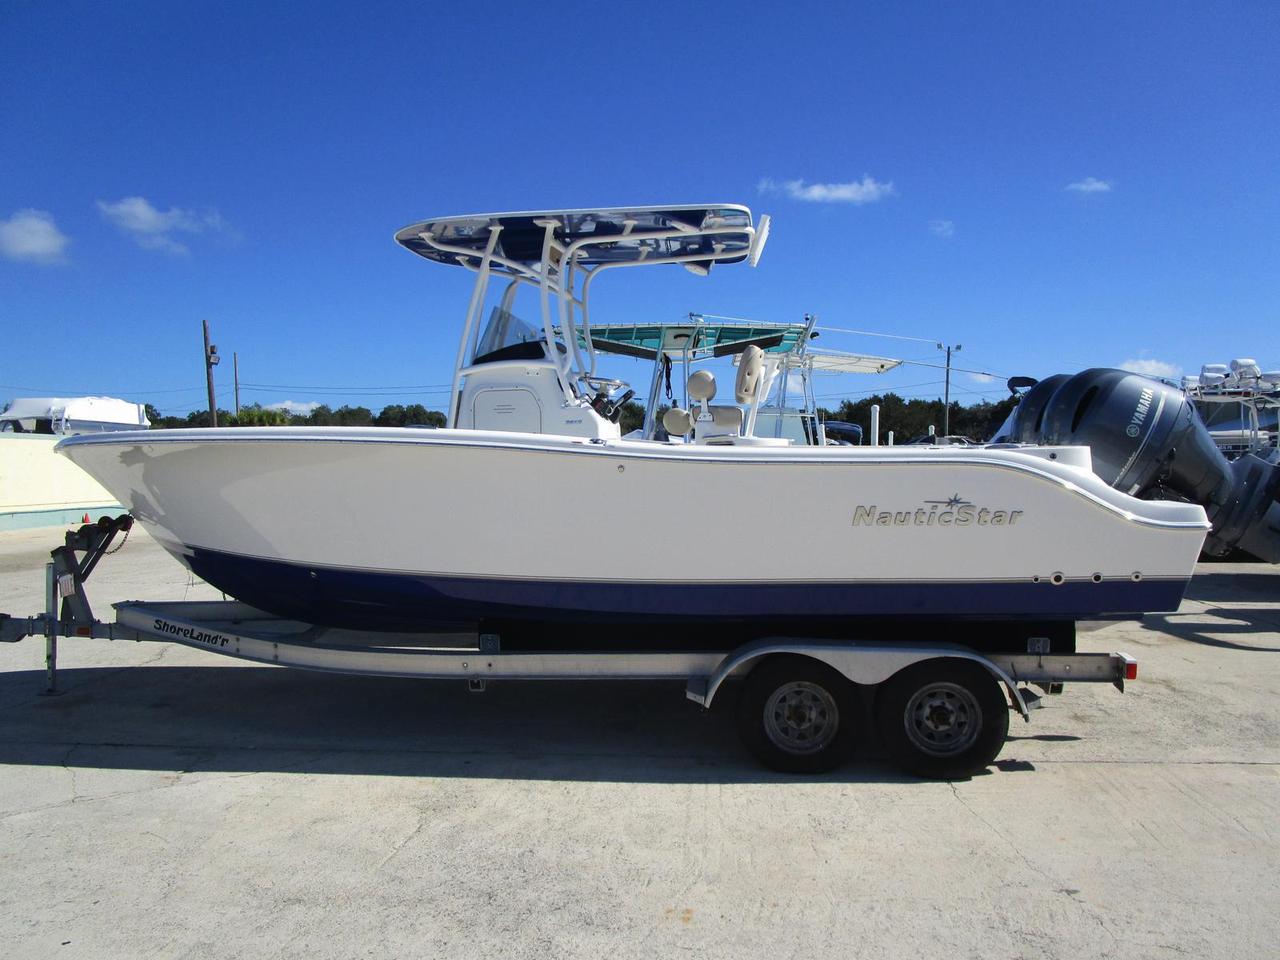 2016 new nautic star 25 xs sports fishing boat for sale for New fishing boats for sale